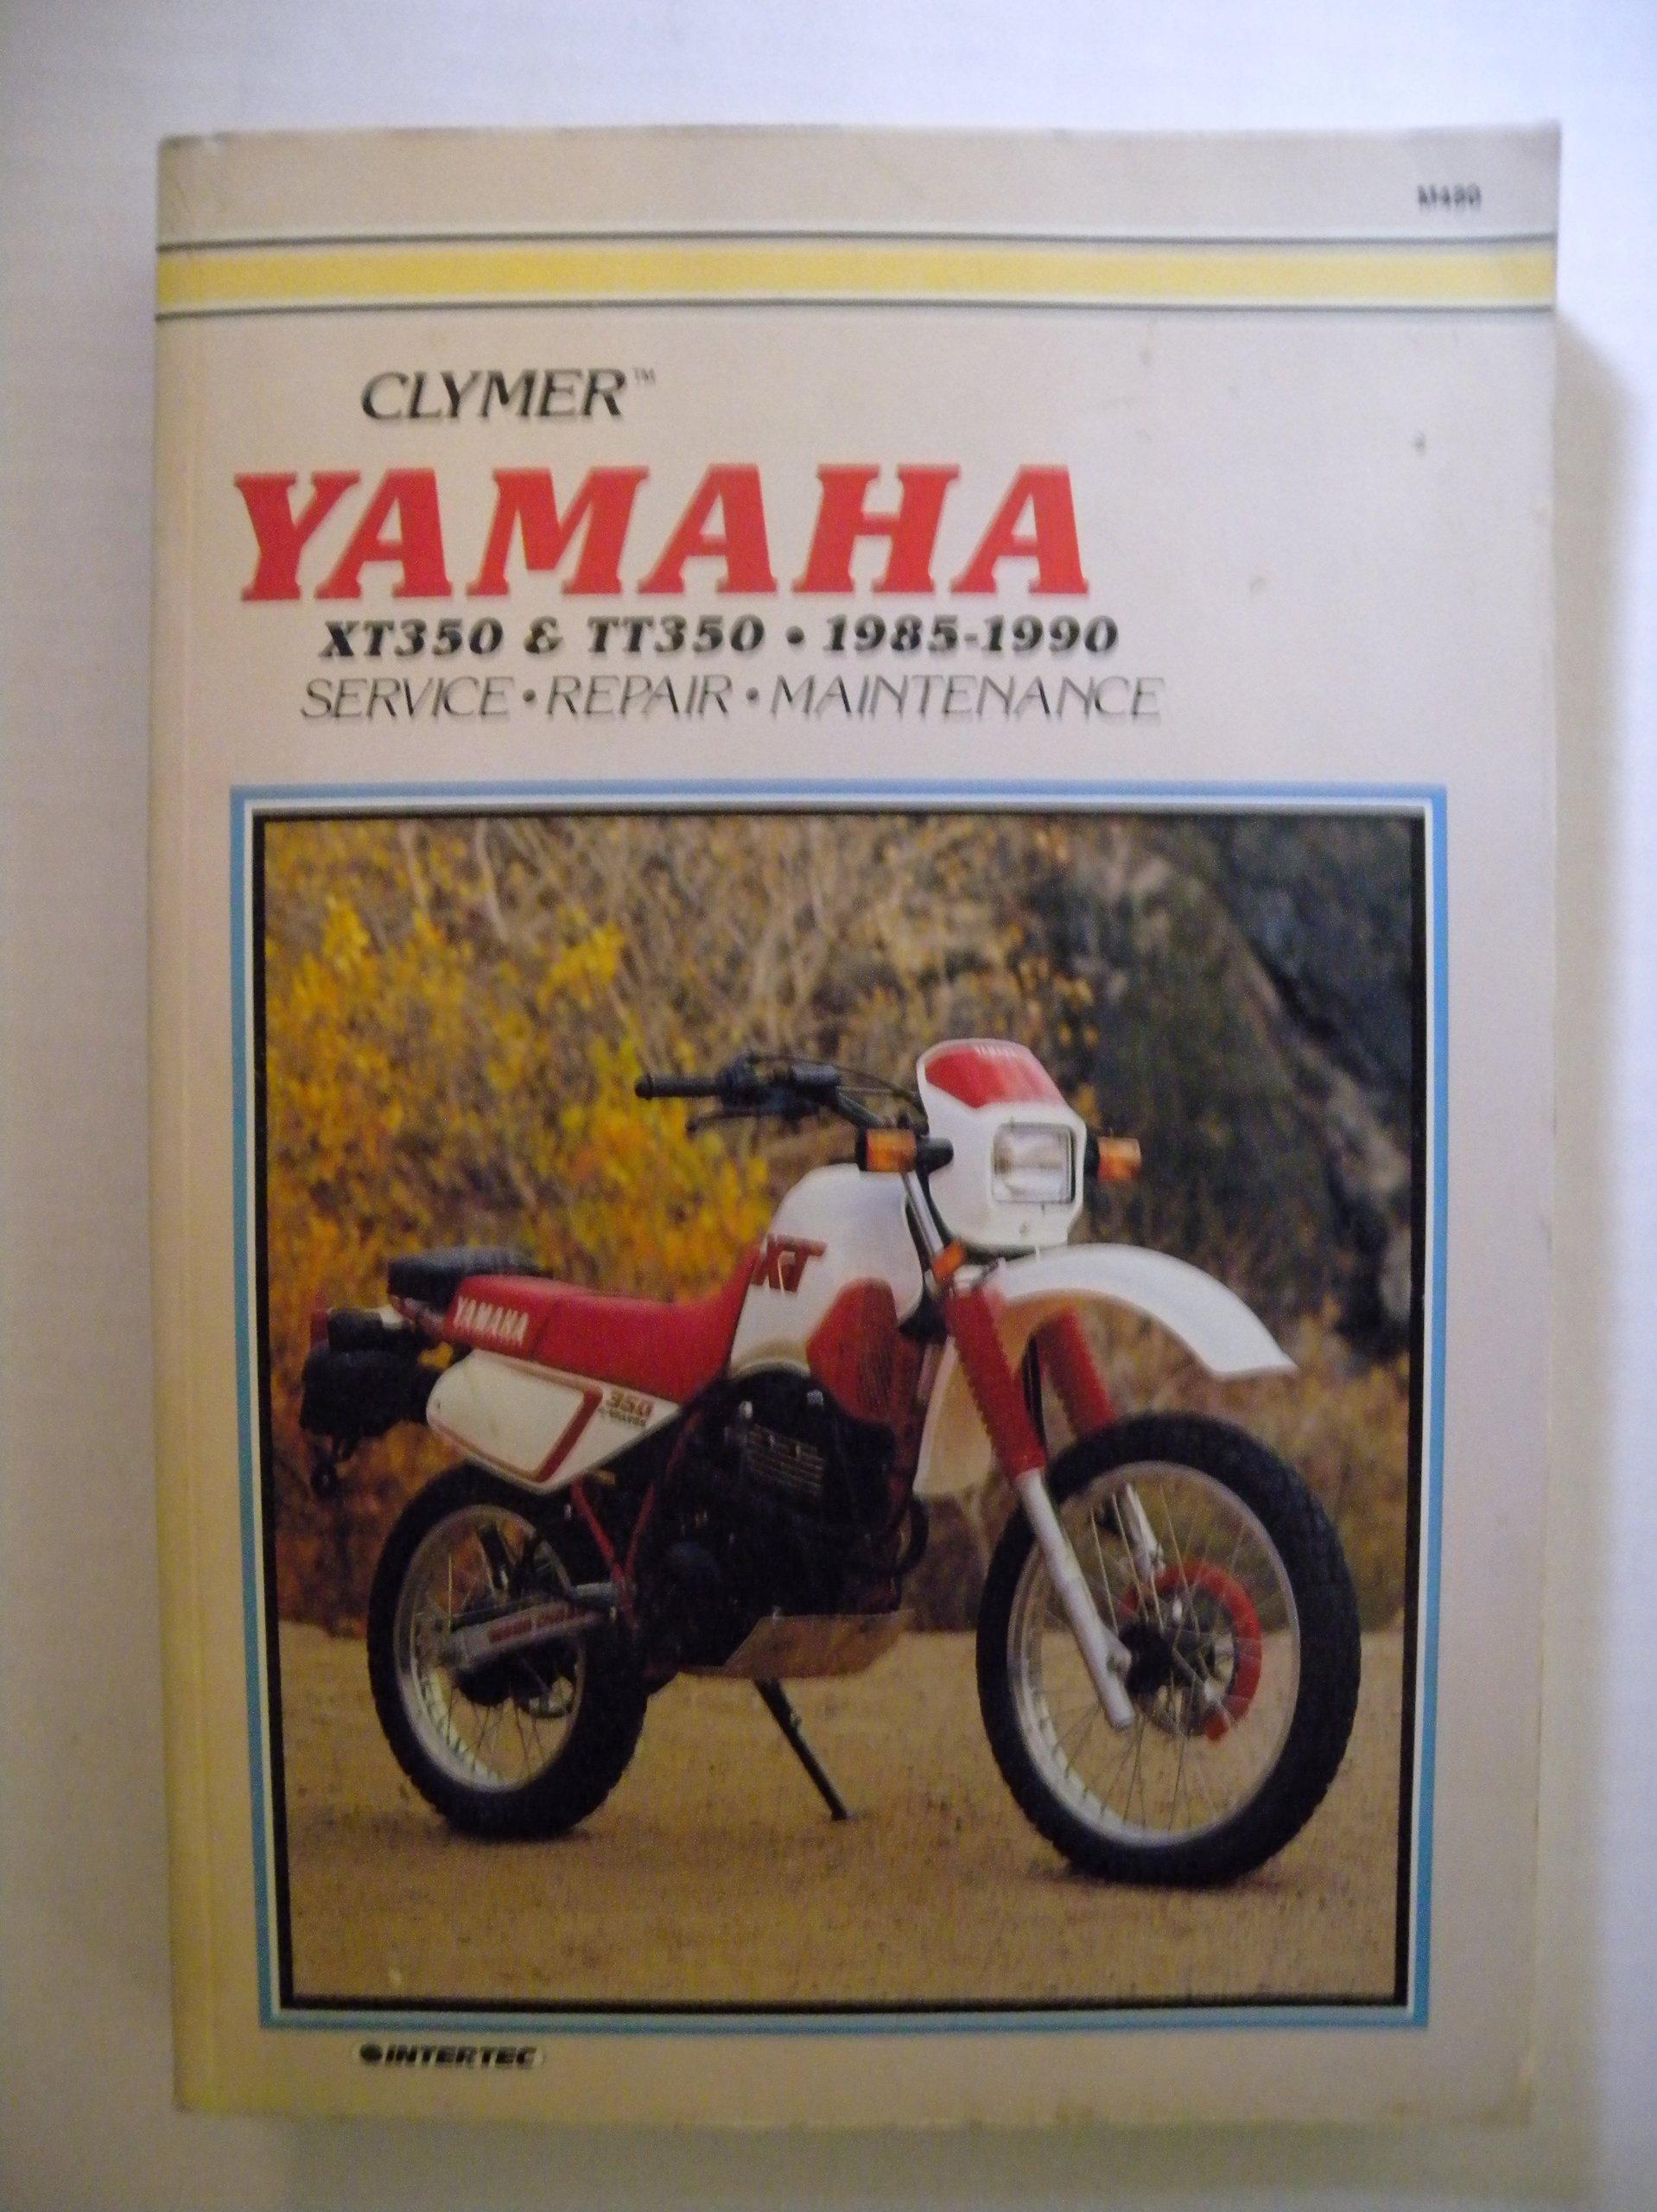 Yamaha Xt350 & Tt350 1985-1990 (Clymer motorcycle repair series)